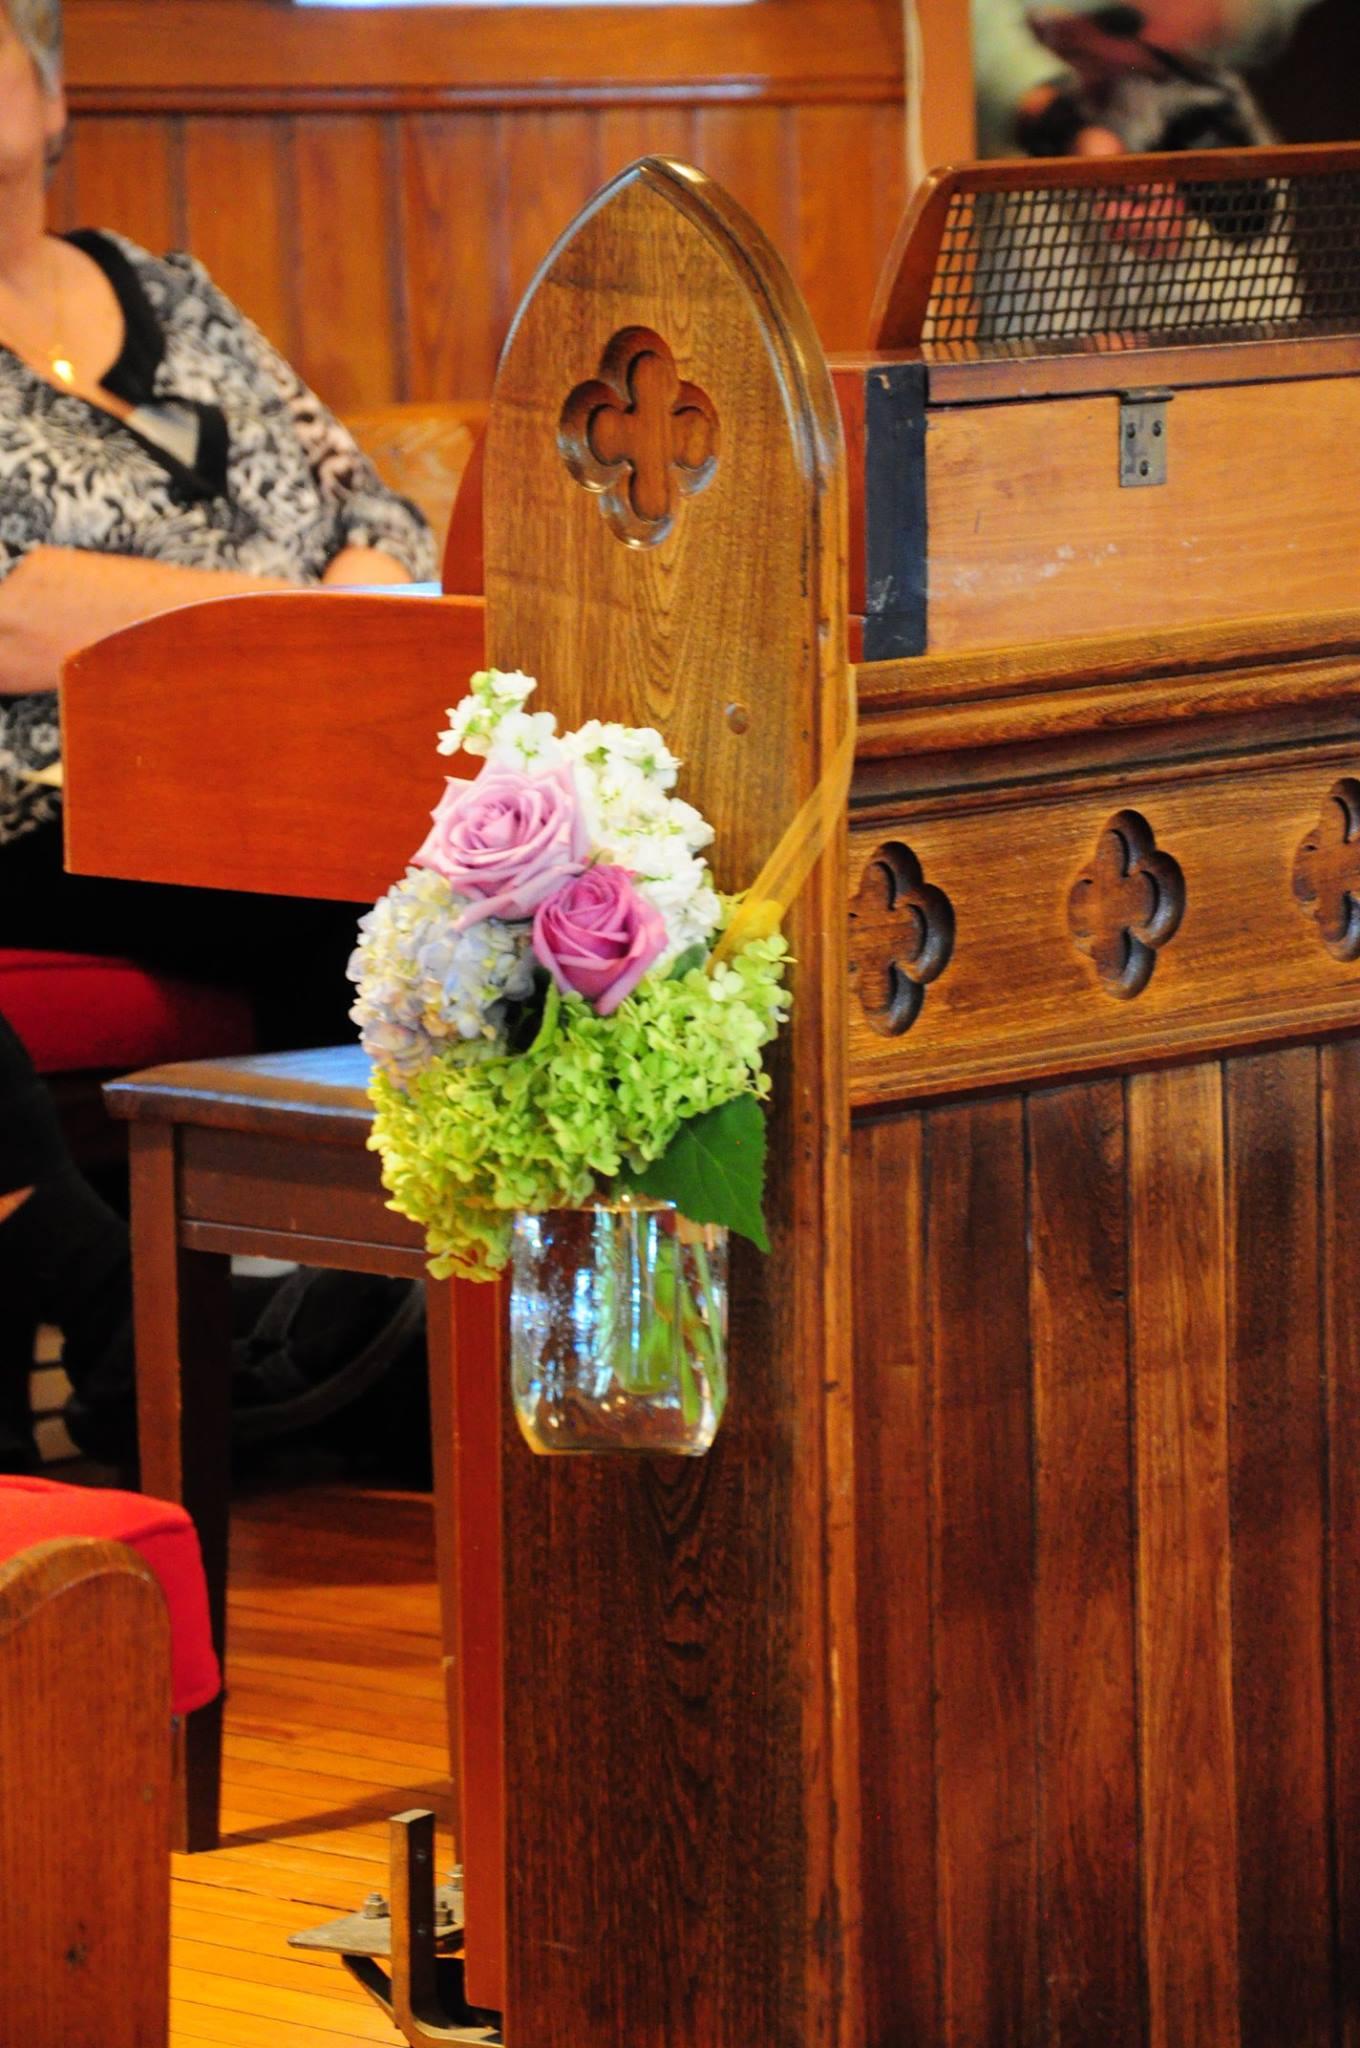 Wedding Bouquet on Pew